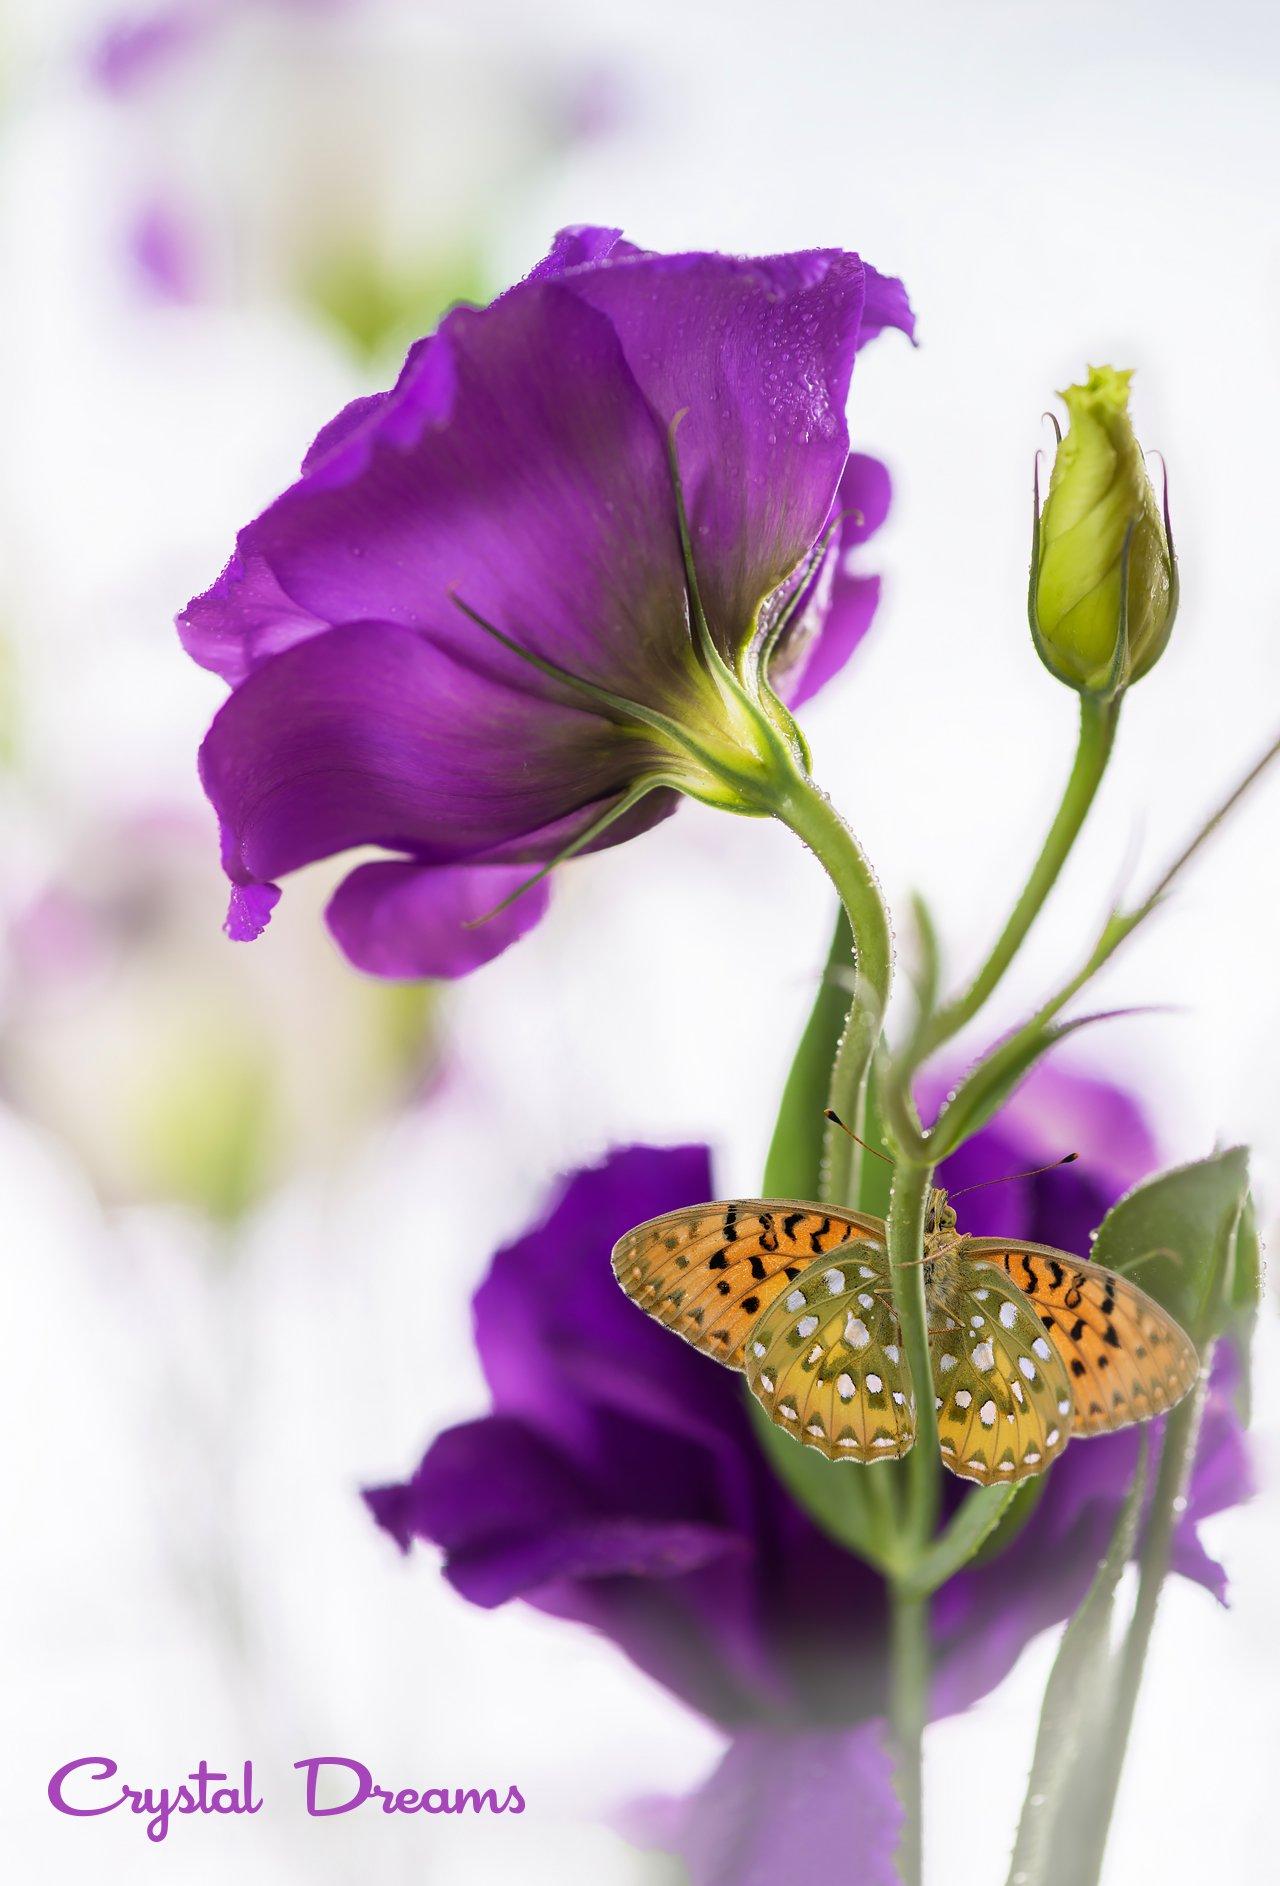 Art, Beauty, Butterfly, Color, Crystal Dreams, Macro, Magic, Nature, Крылова Татьяна